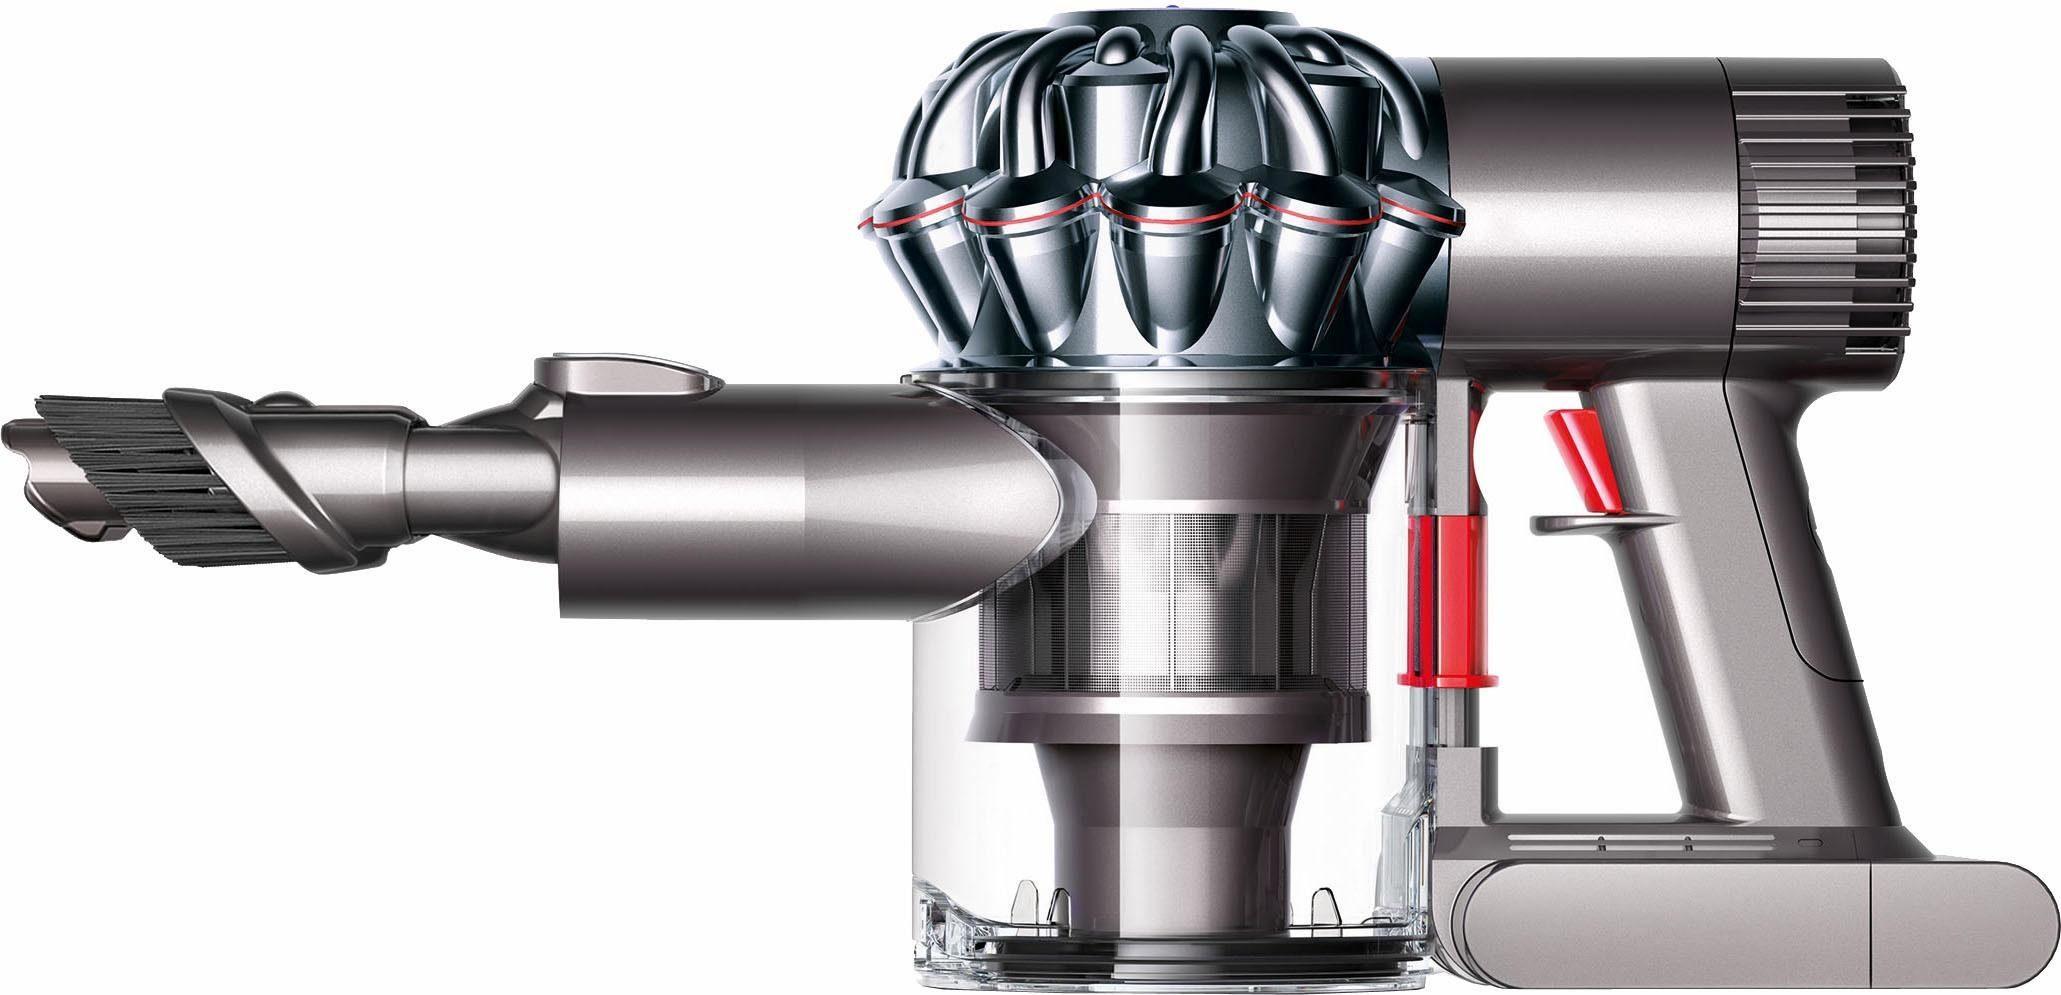 DYSON Akku-Handstaubsauger V6 Trigger, 350 Watt, beutellos